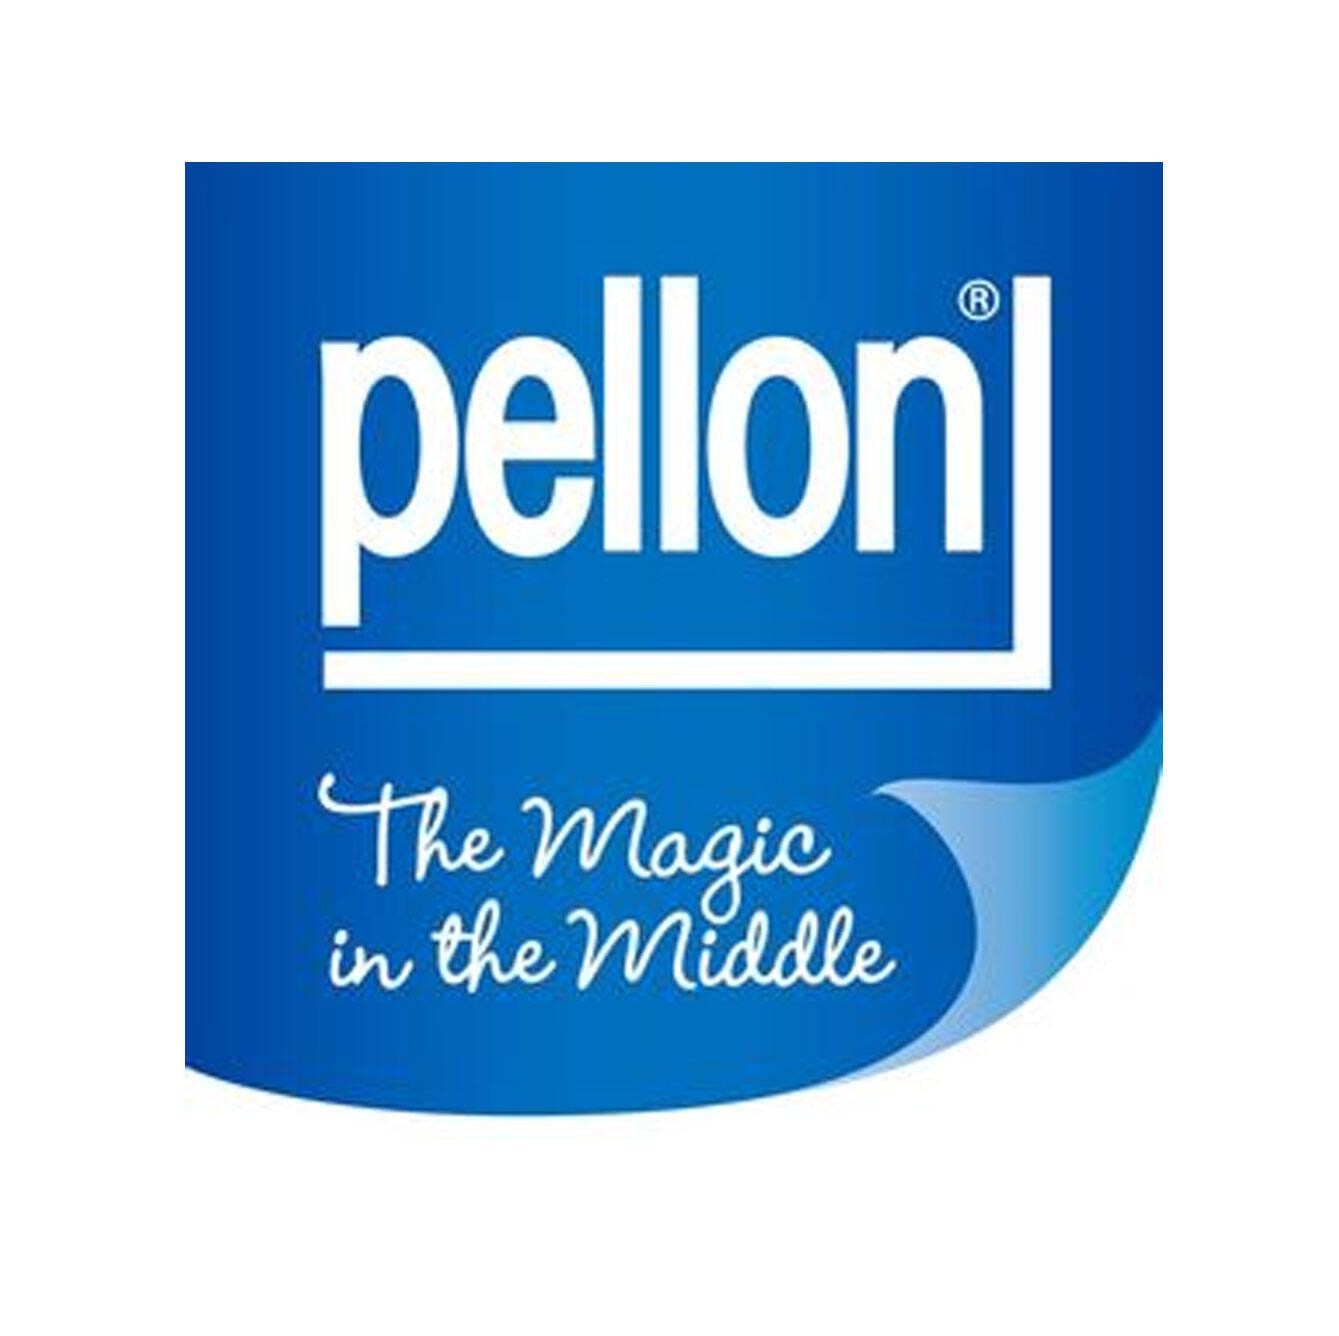 Pellon Consumer Products